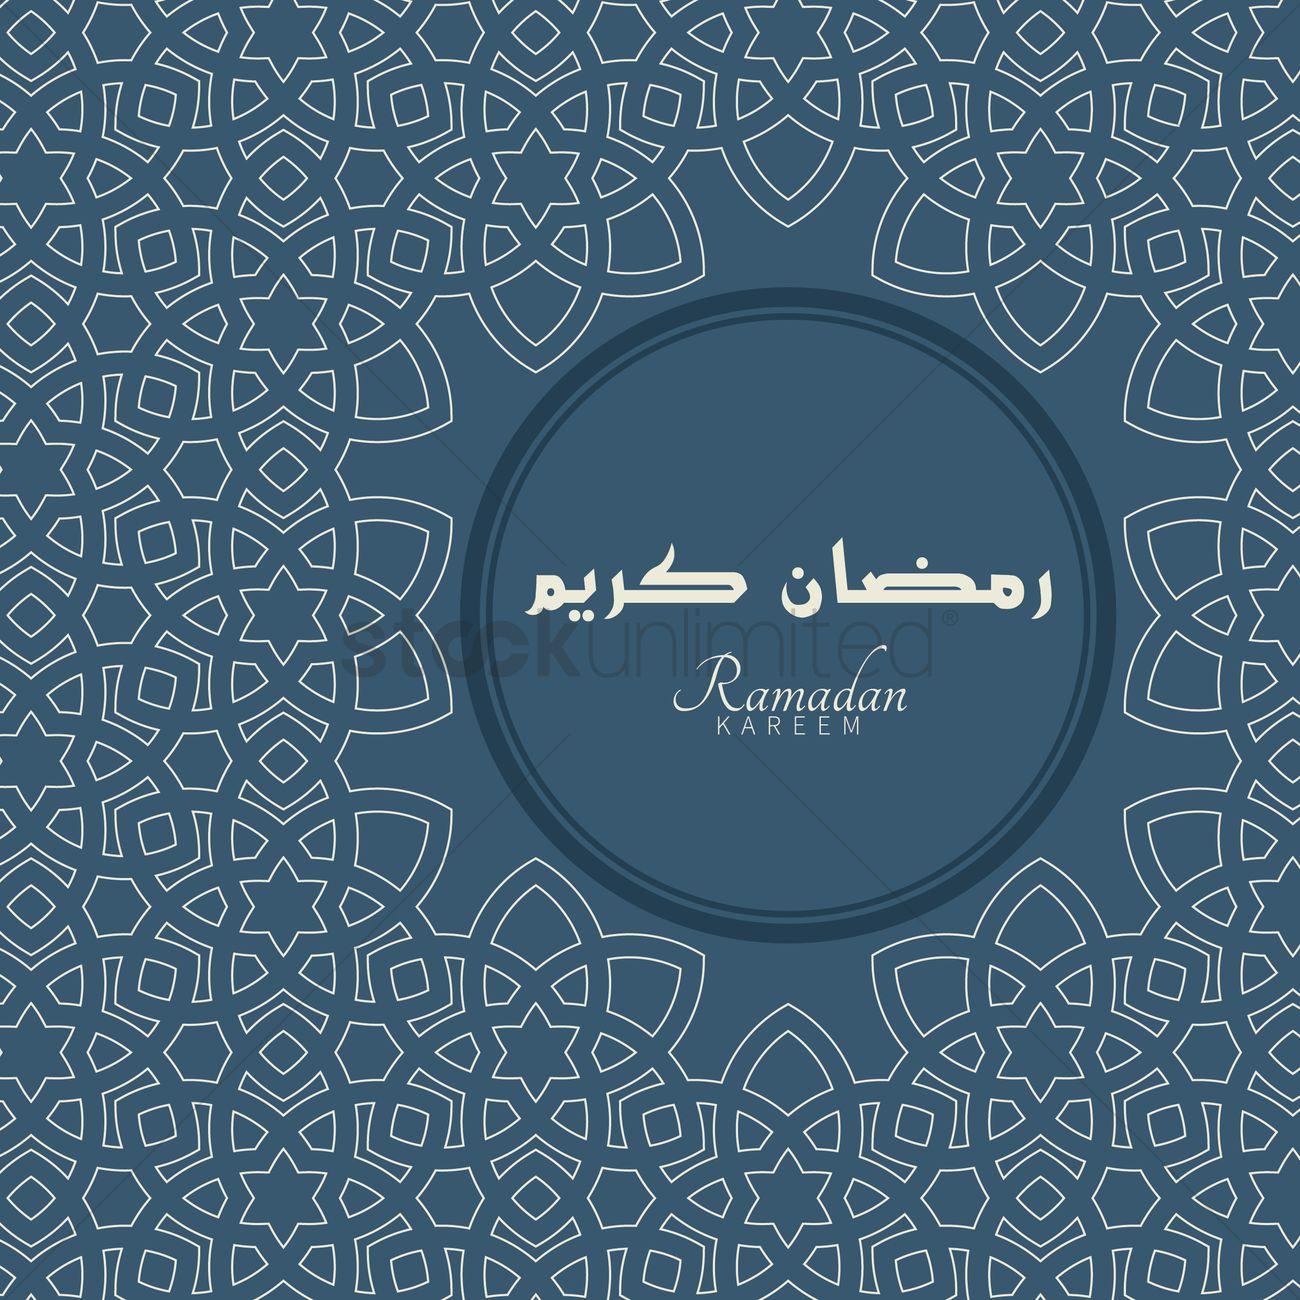 Ramadan Kareem Greeting In Jawi Vector Image 1827024 Stockunlimited